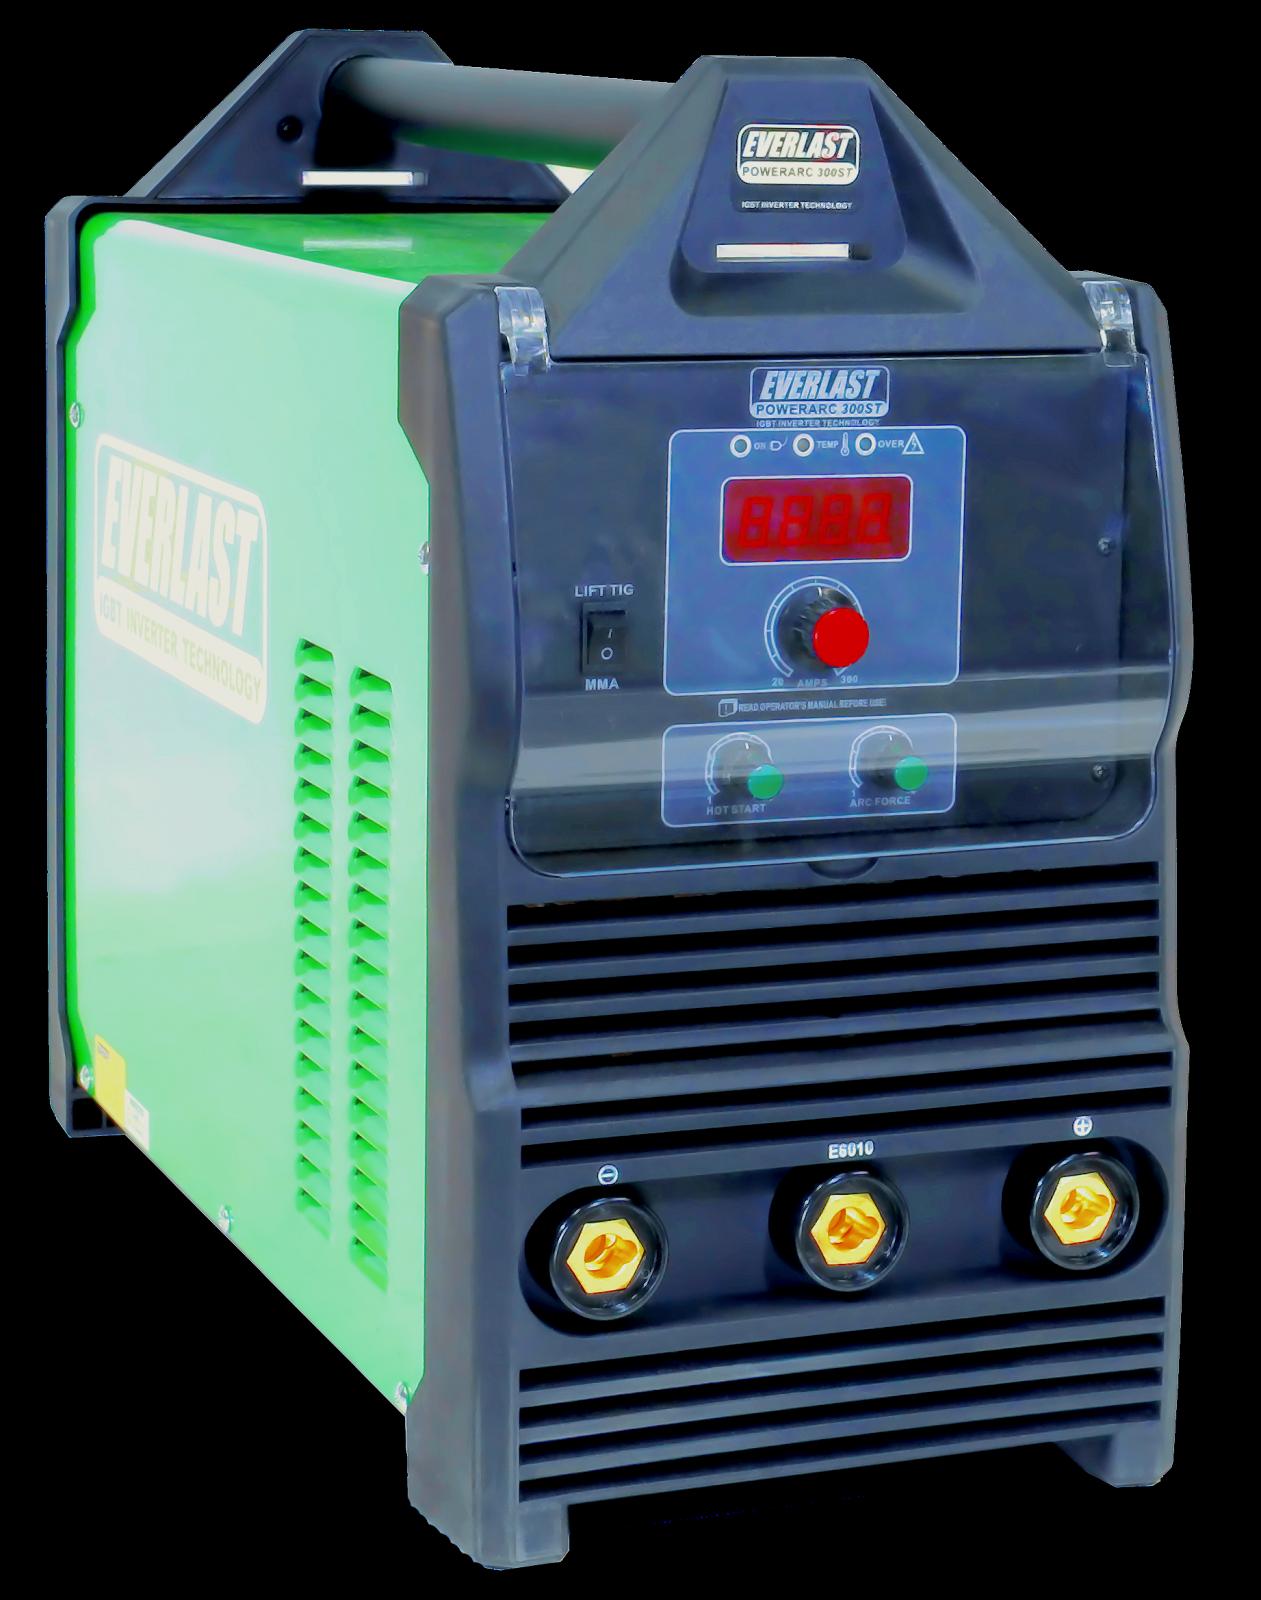 PowerARC 300ST | Everlast Generators